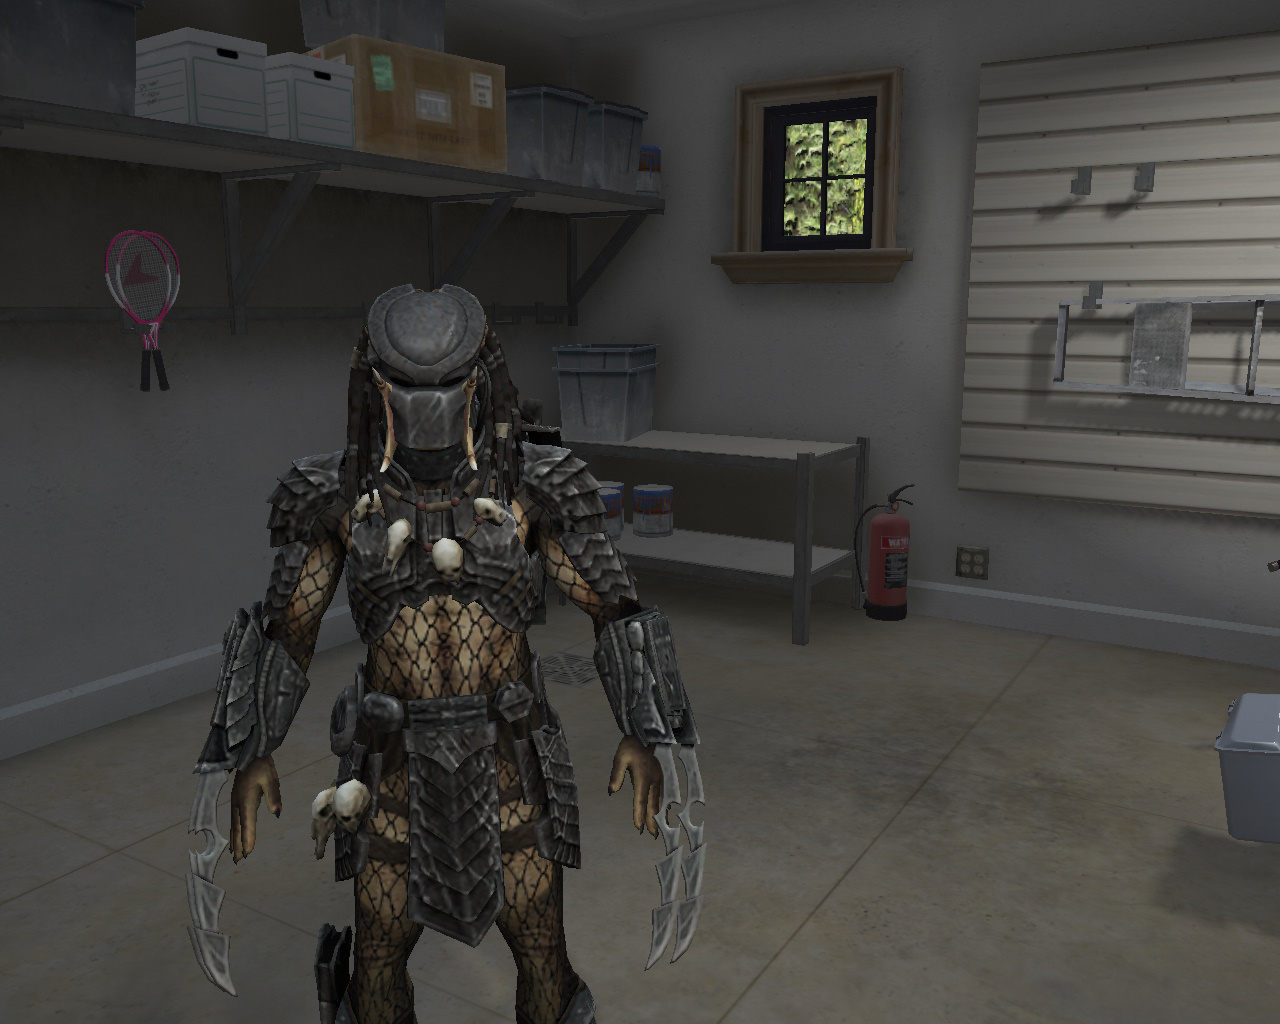 Gta 5 Predator Mod Menu